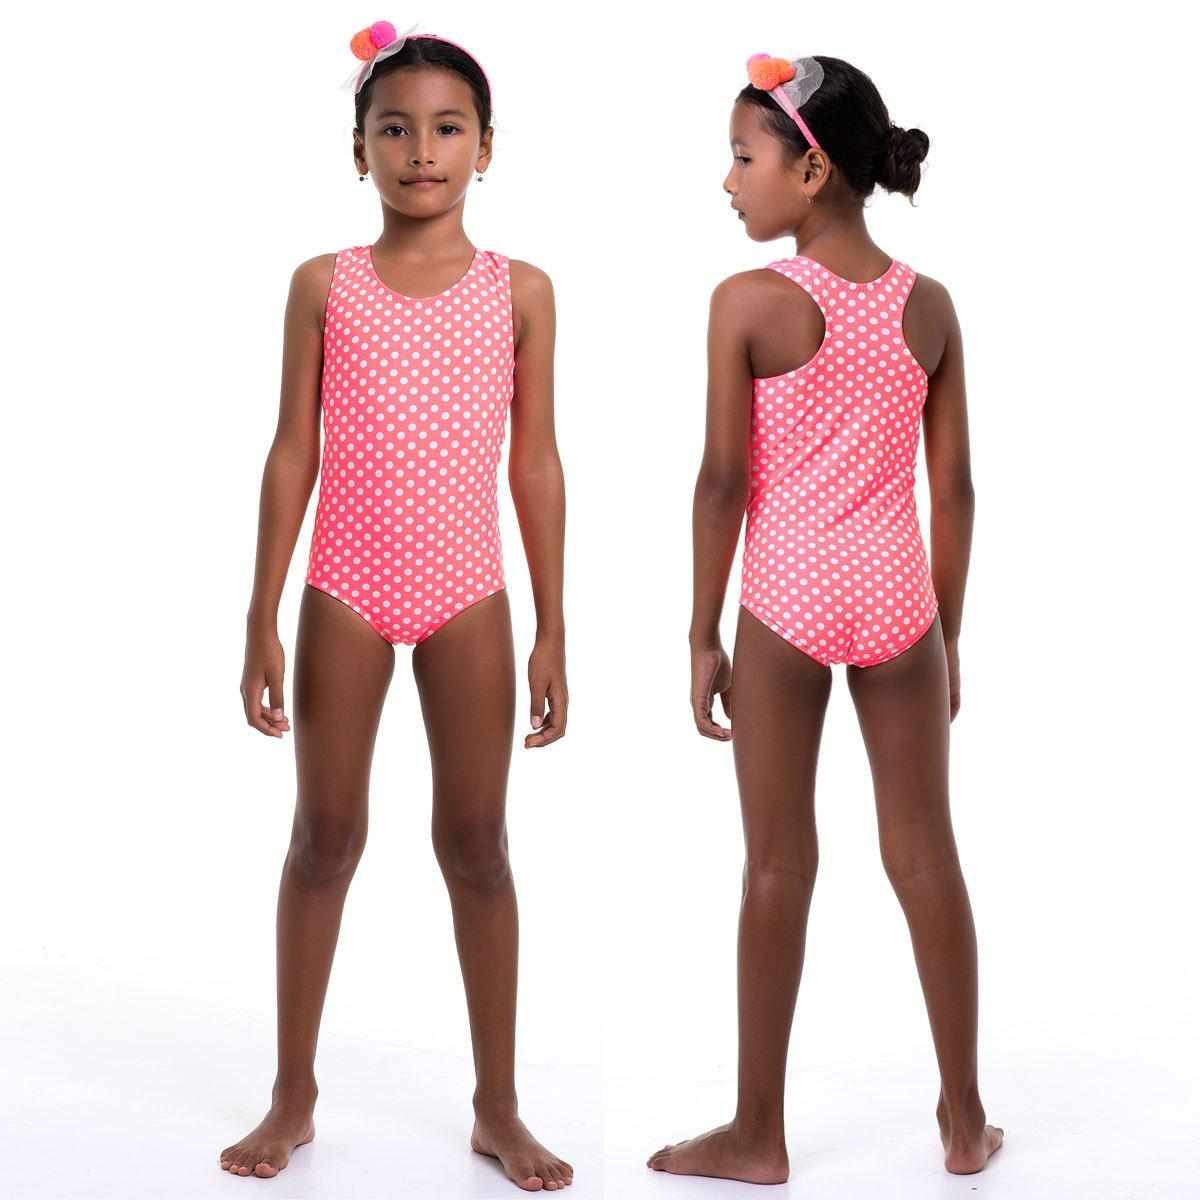 Swimsuit patterns leotard pattern swimwear sewing pattern this is a digital file jeuxipadfo Gallery